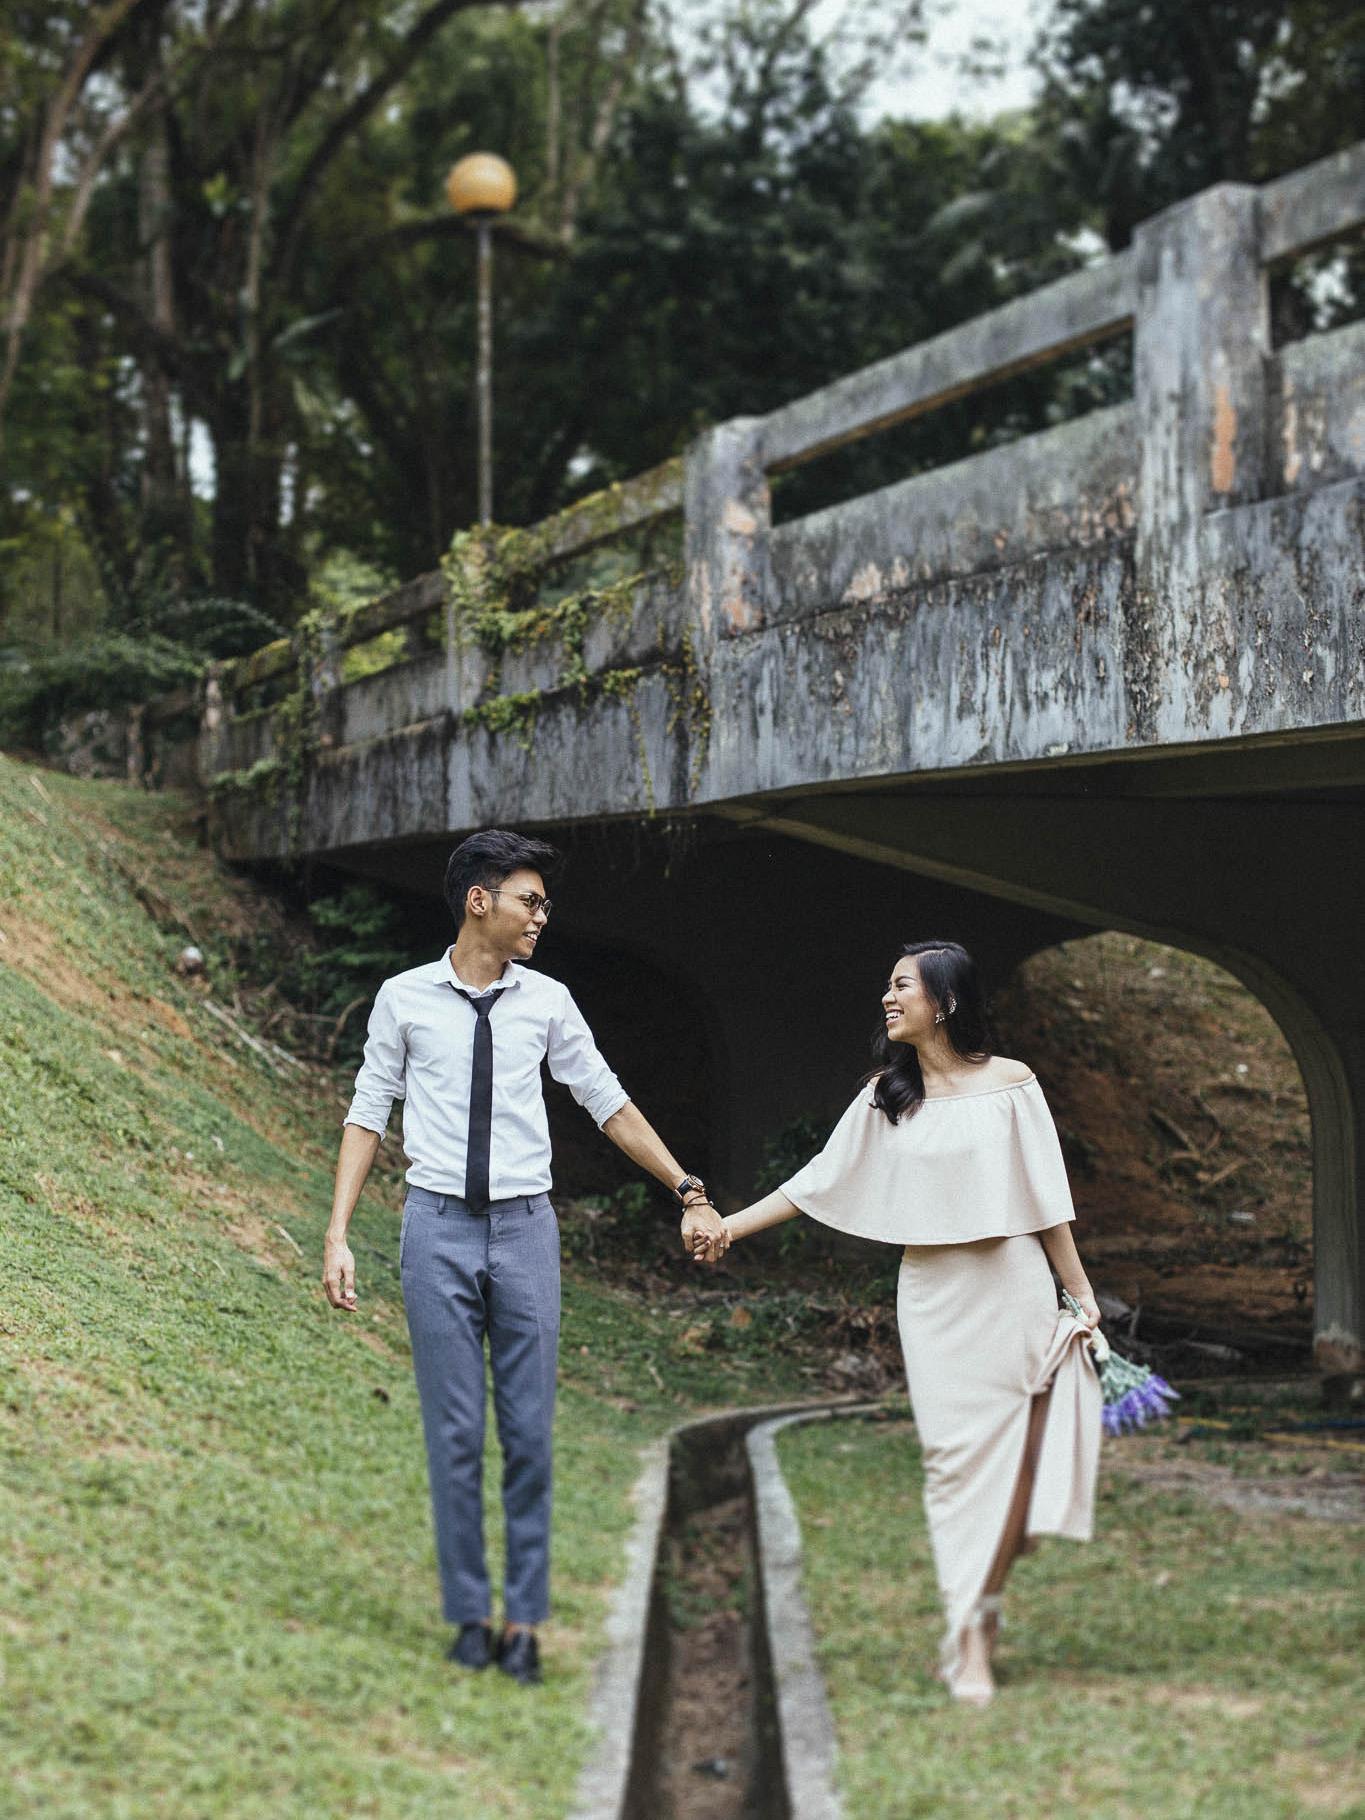 singapore-wedding-photographer-malay-travel-adli-tashah-06.jpg